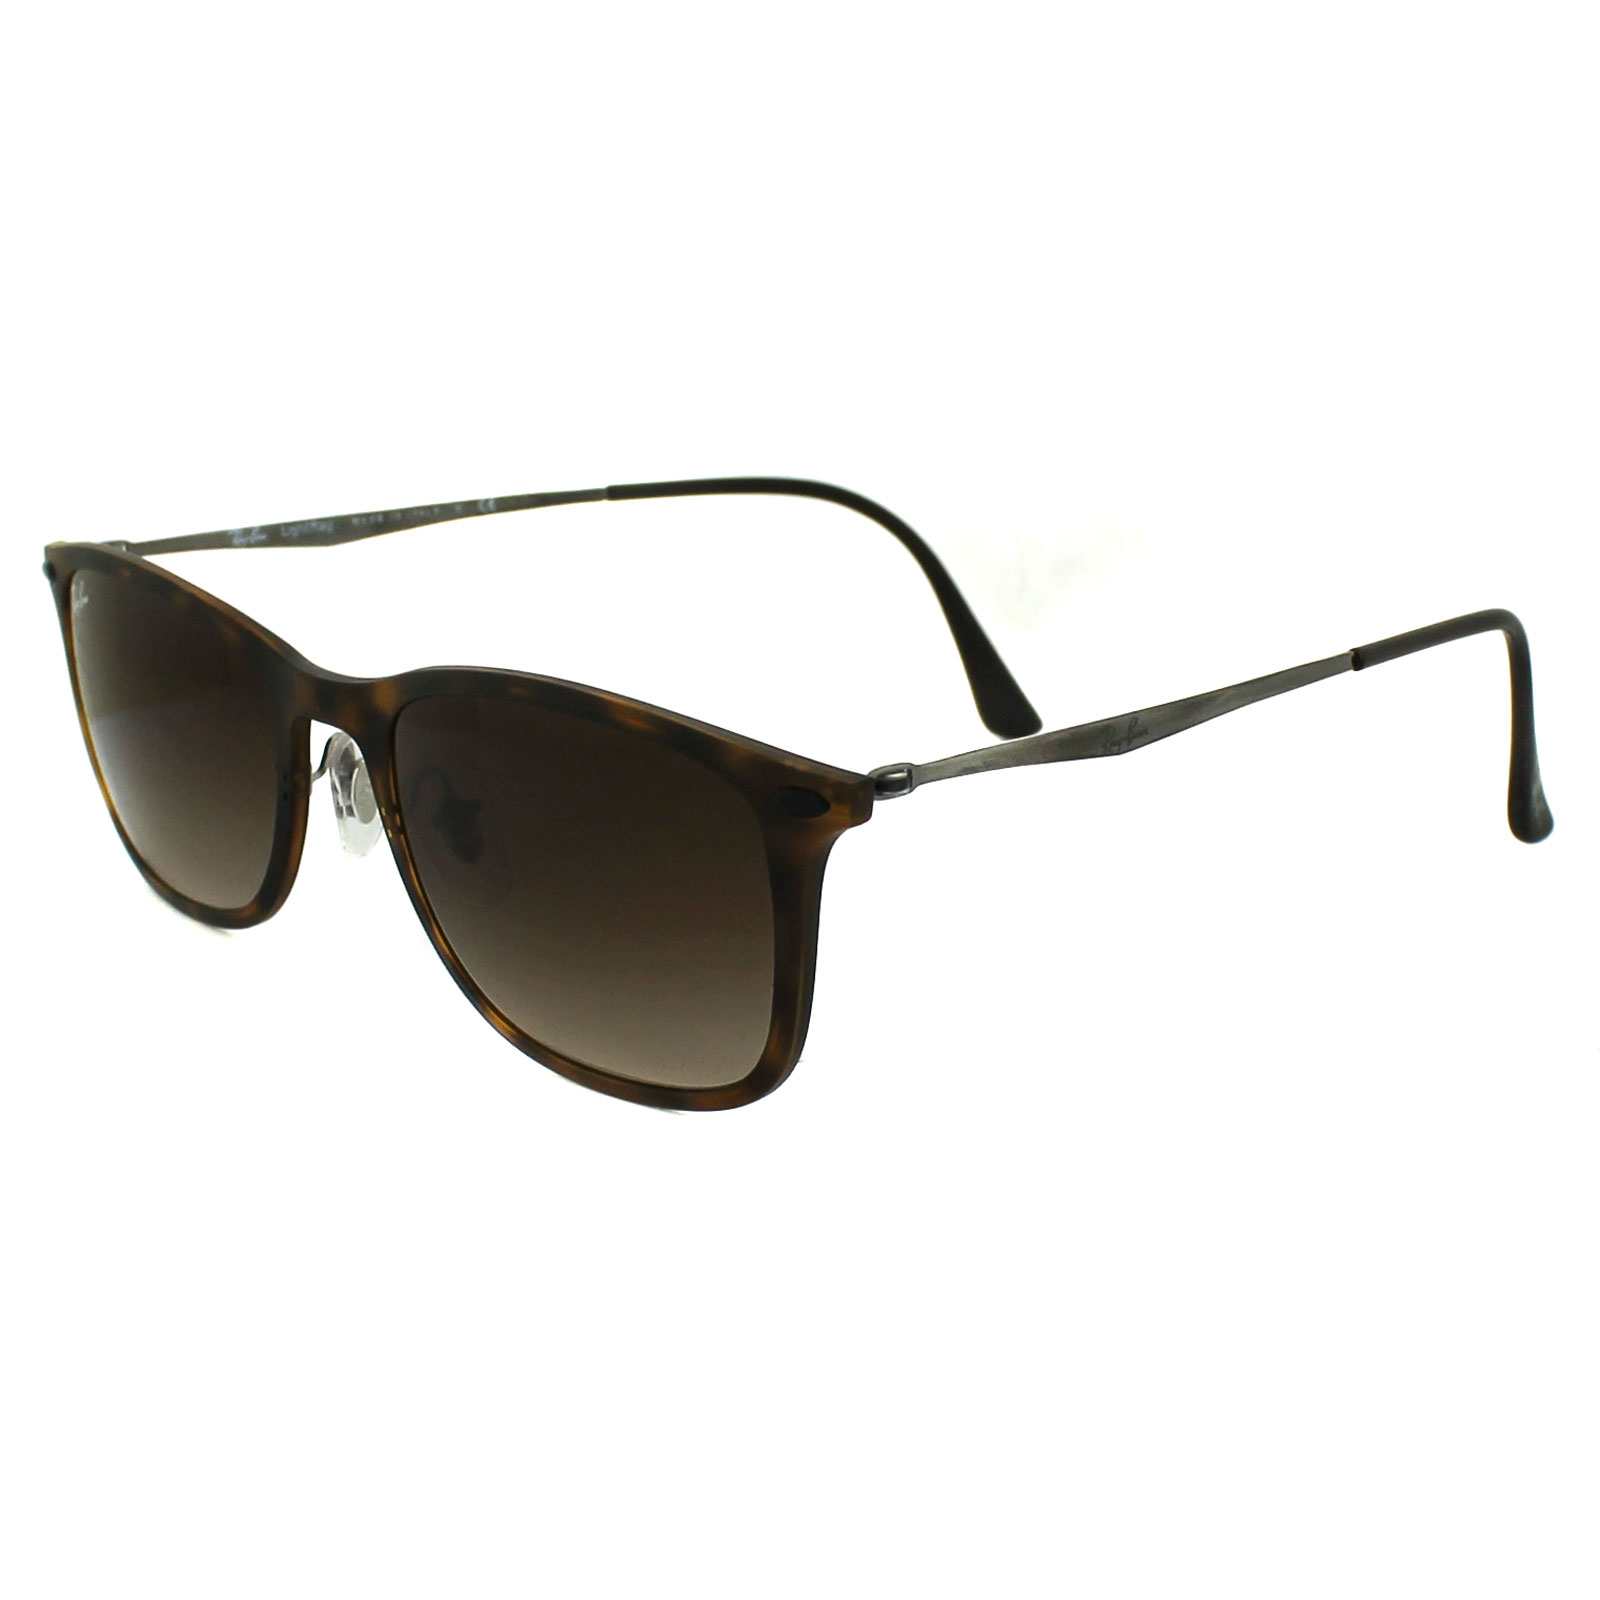 e19f108292e Sentinel Ray-Ban Sunglasses New Wayfarer Light Ray 4225 894 13 Tortoise  Brown Gradient